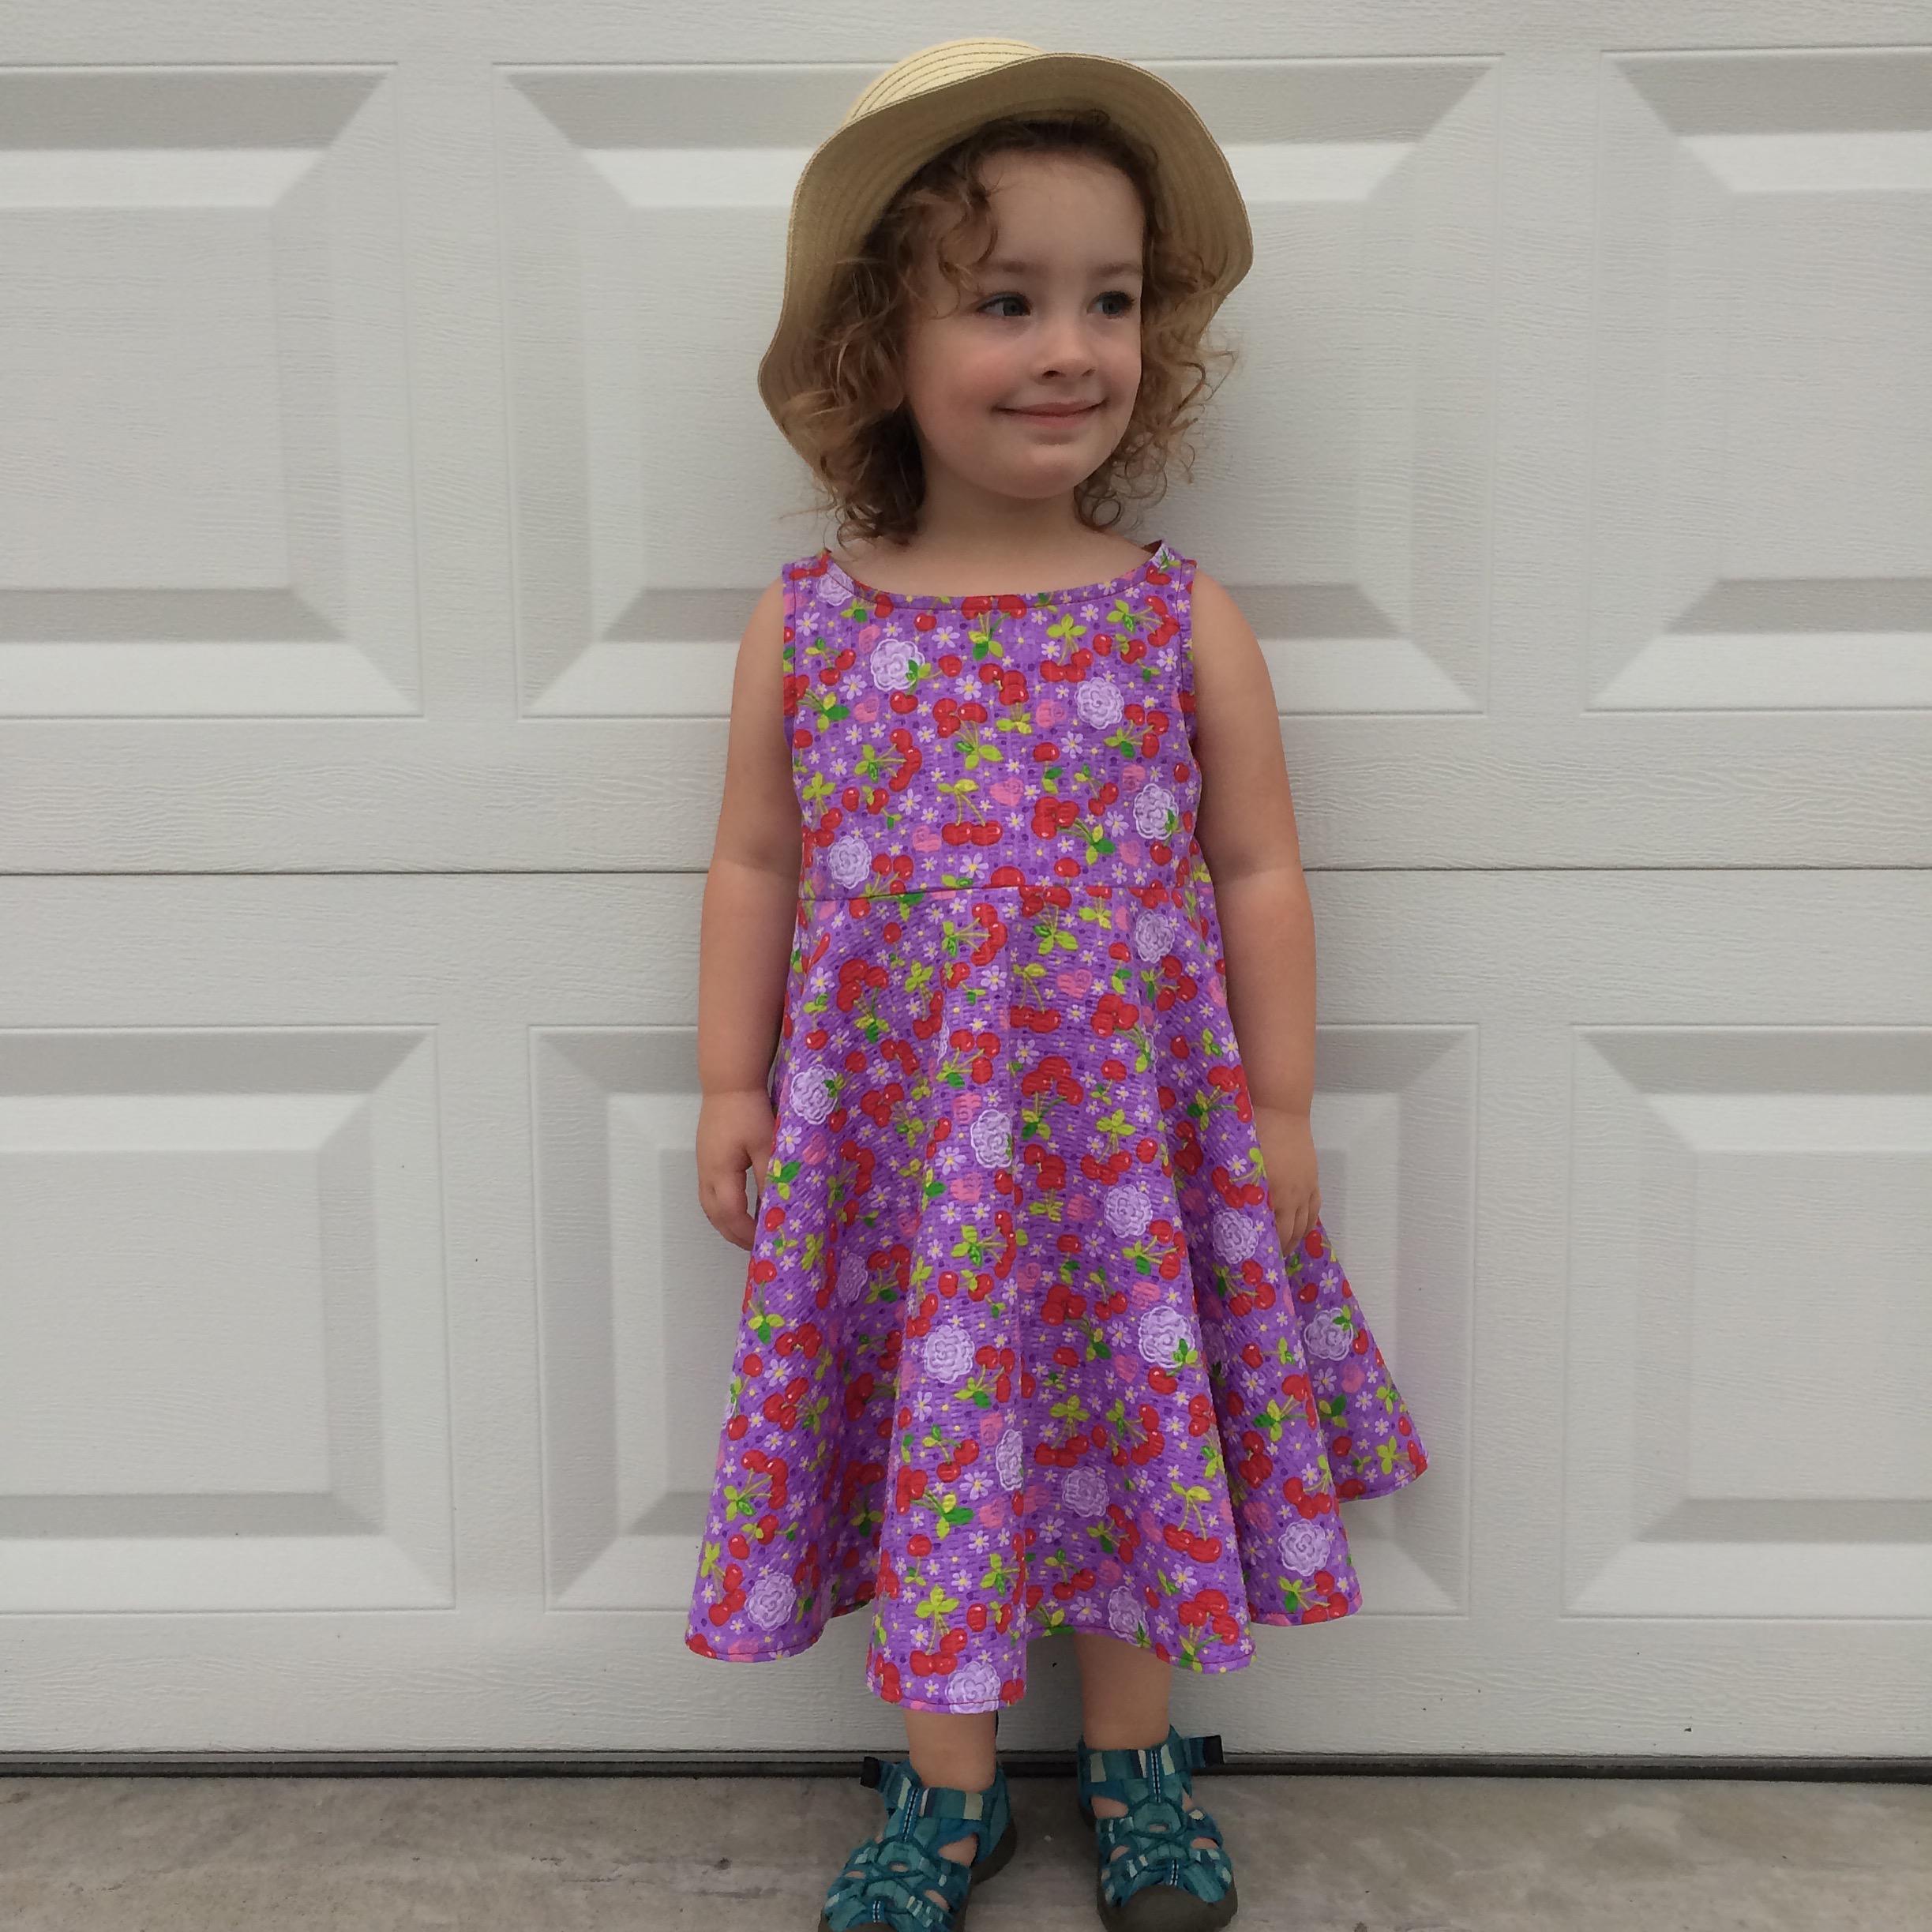 Blueberry's Dress